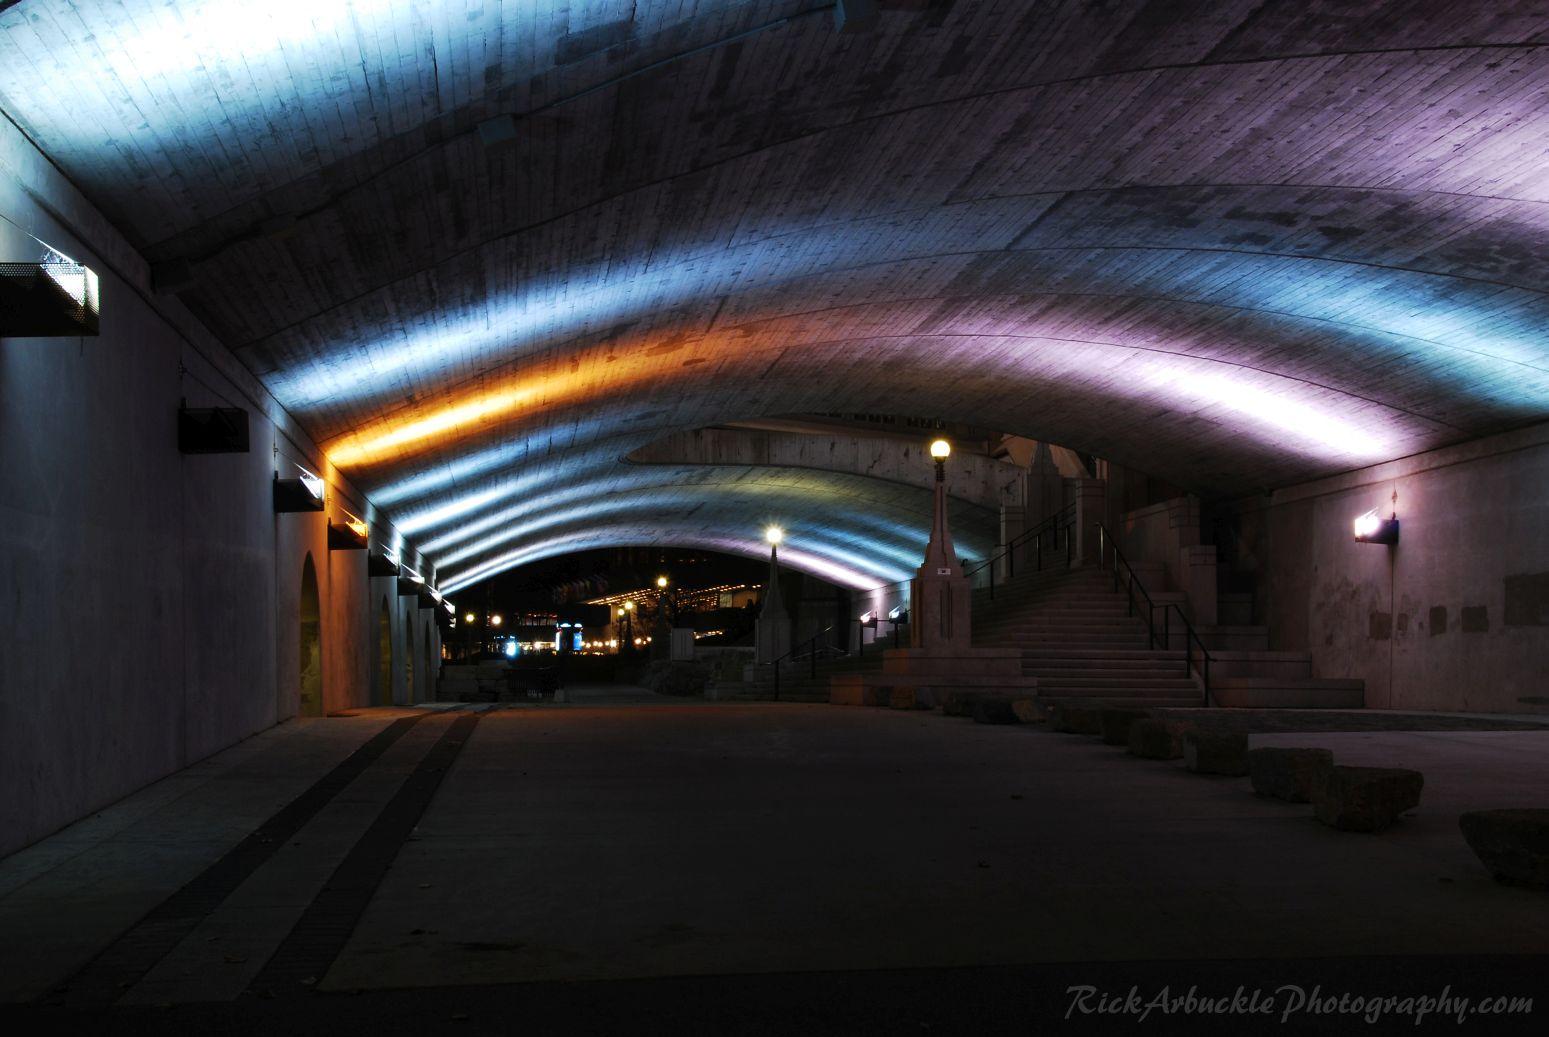 Under Rideau St at night copy.jpg